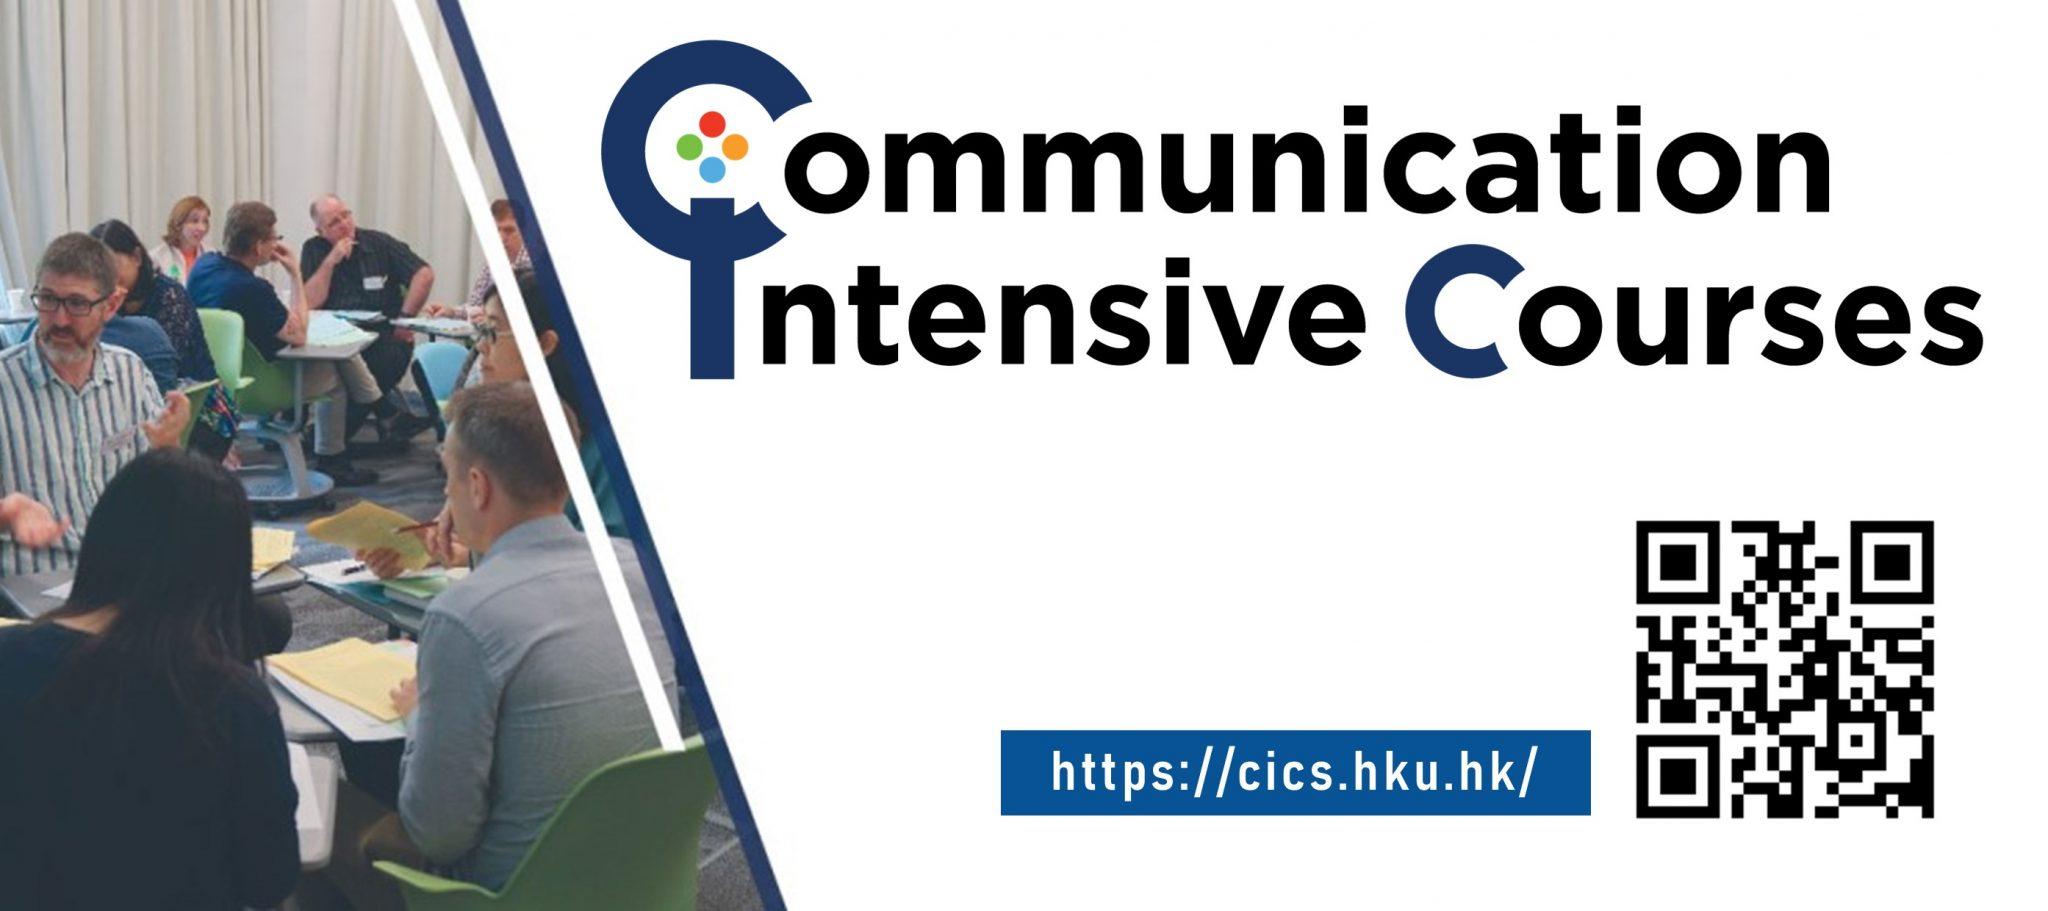 cic website banner